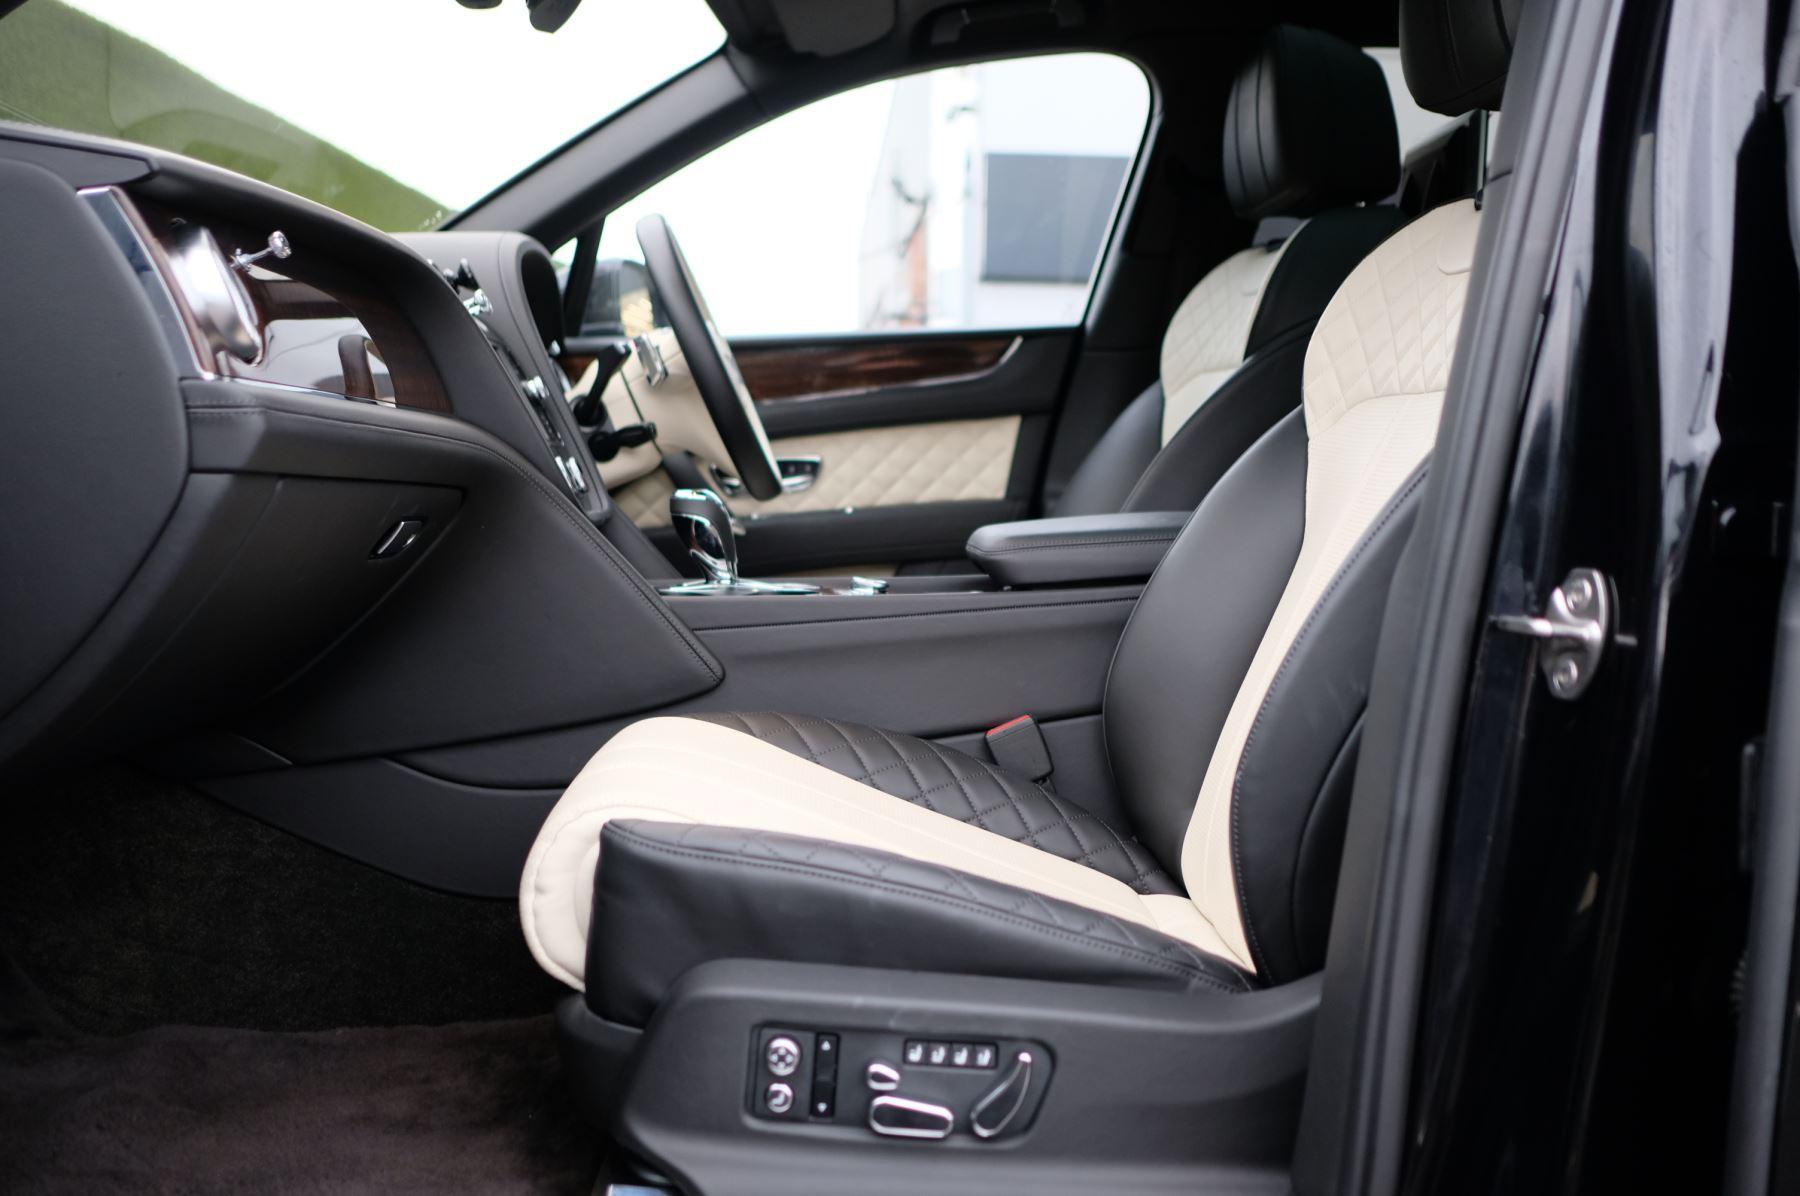 Bentley Bentayga Diesel 4.0 V8 Mulliner Driving Spec 5dr Auto - 7 Seat Specification image 20